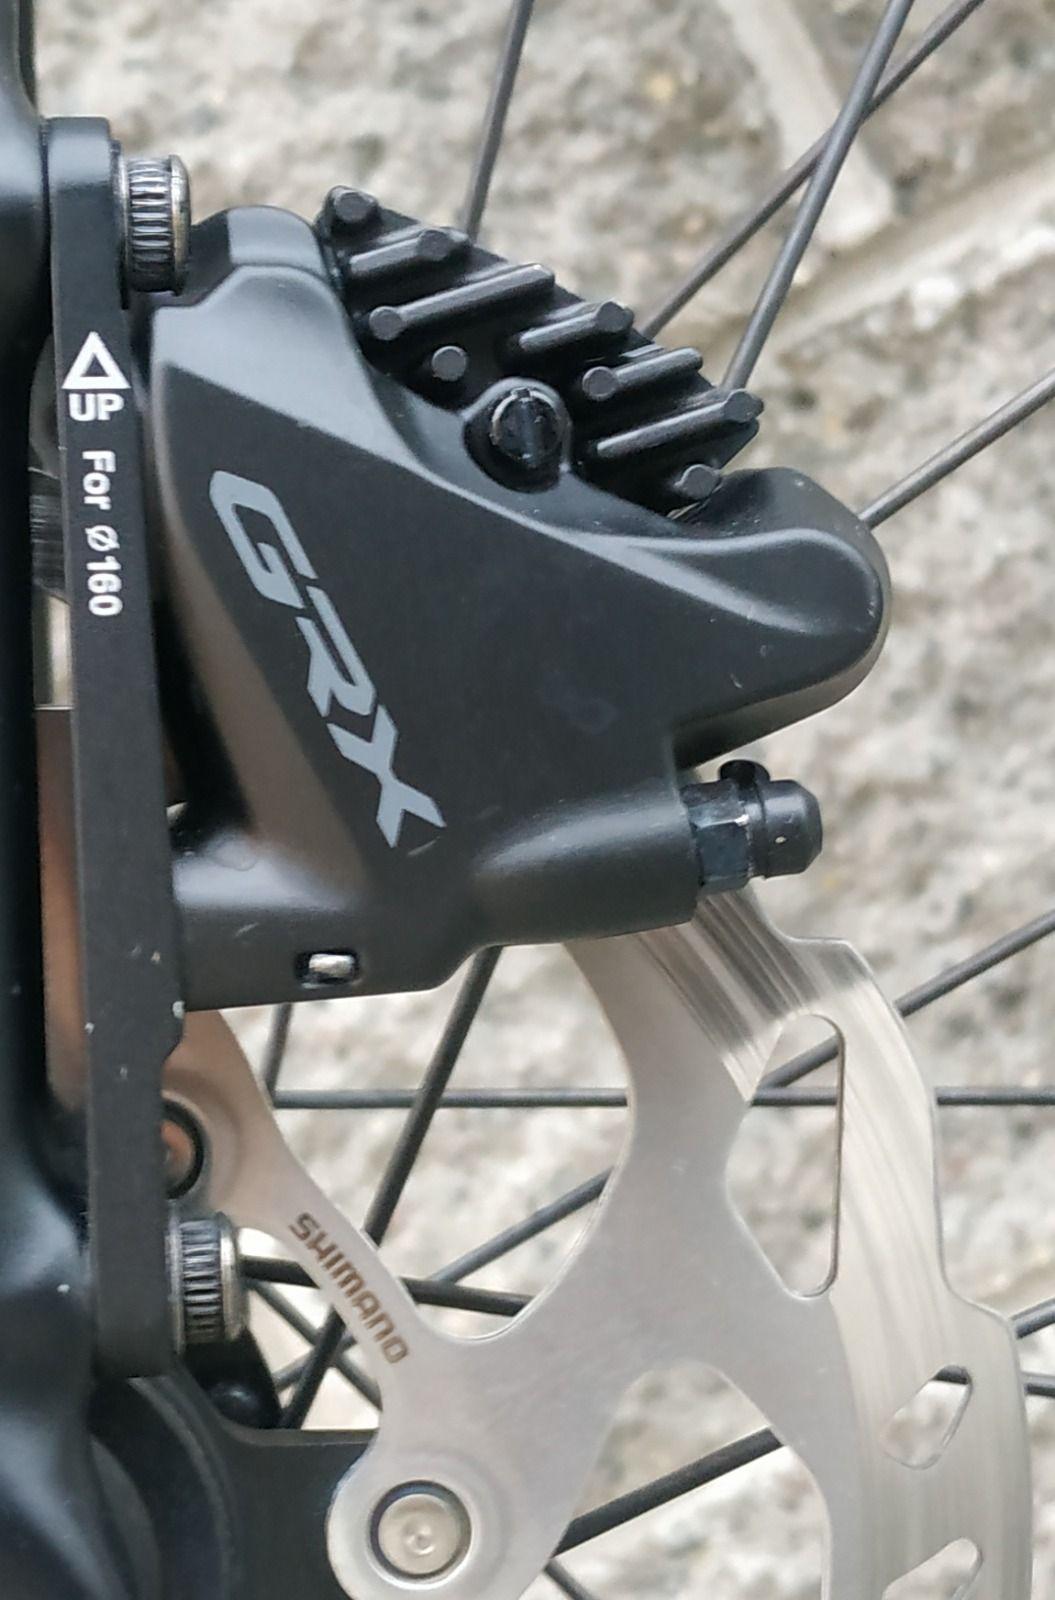 Shimano GRX RX600 groupset